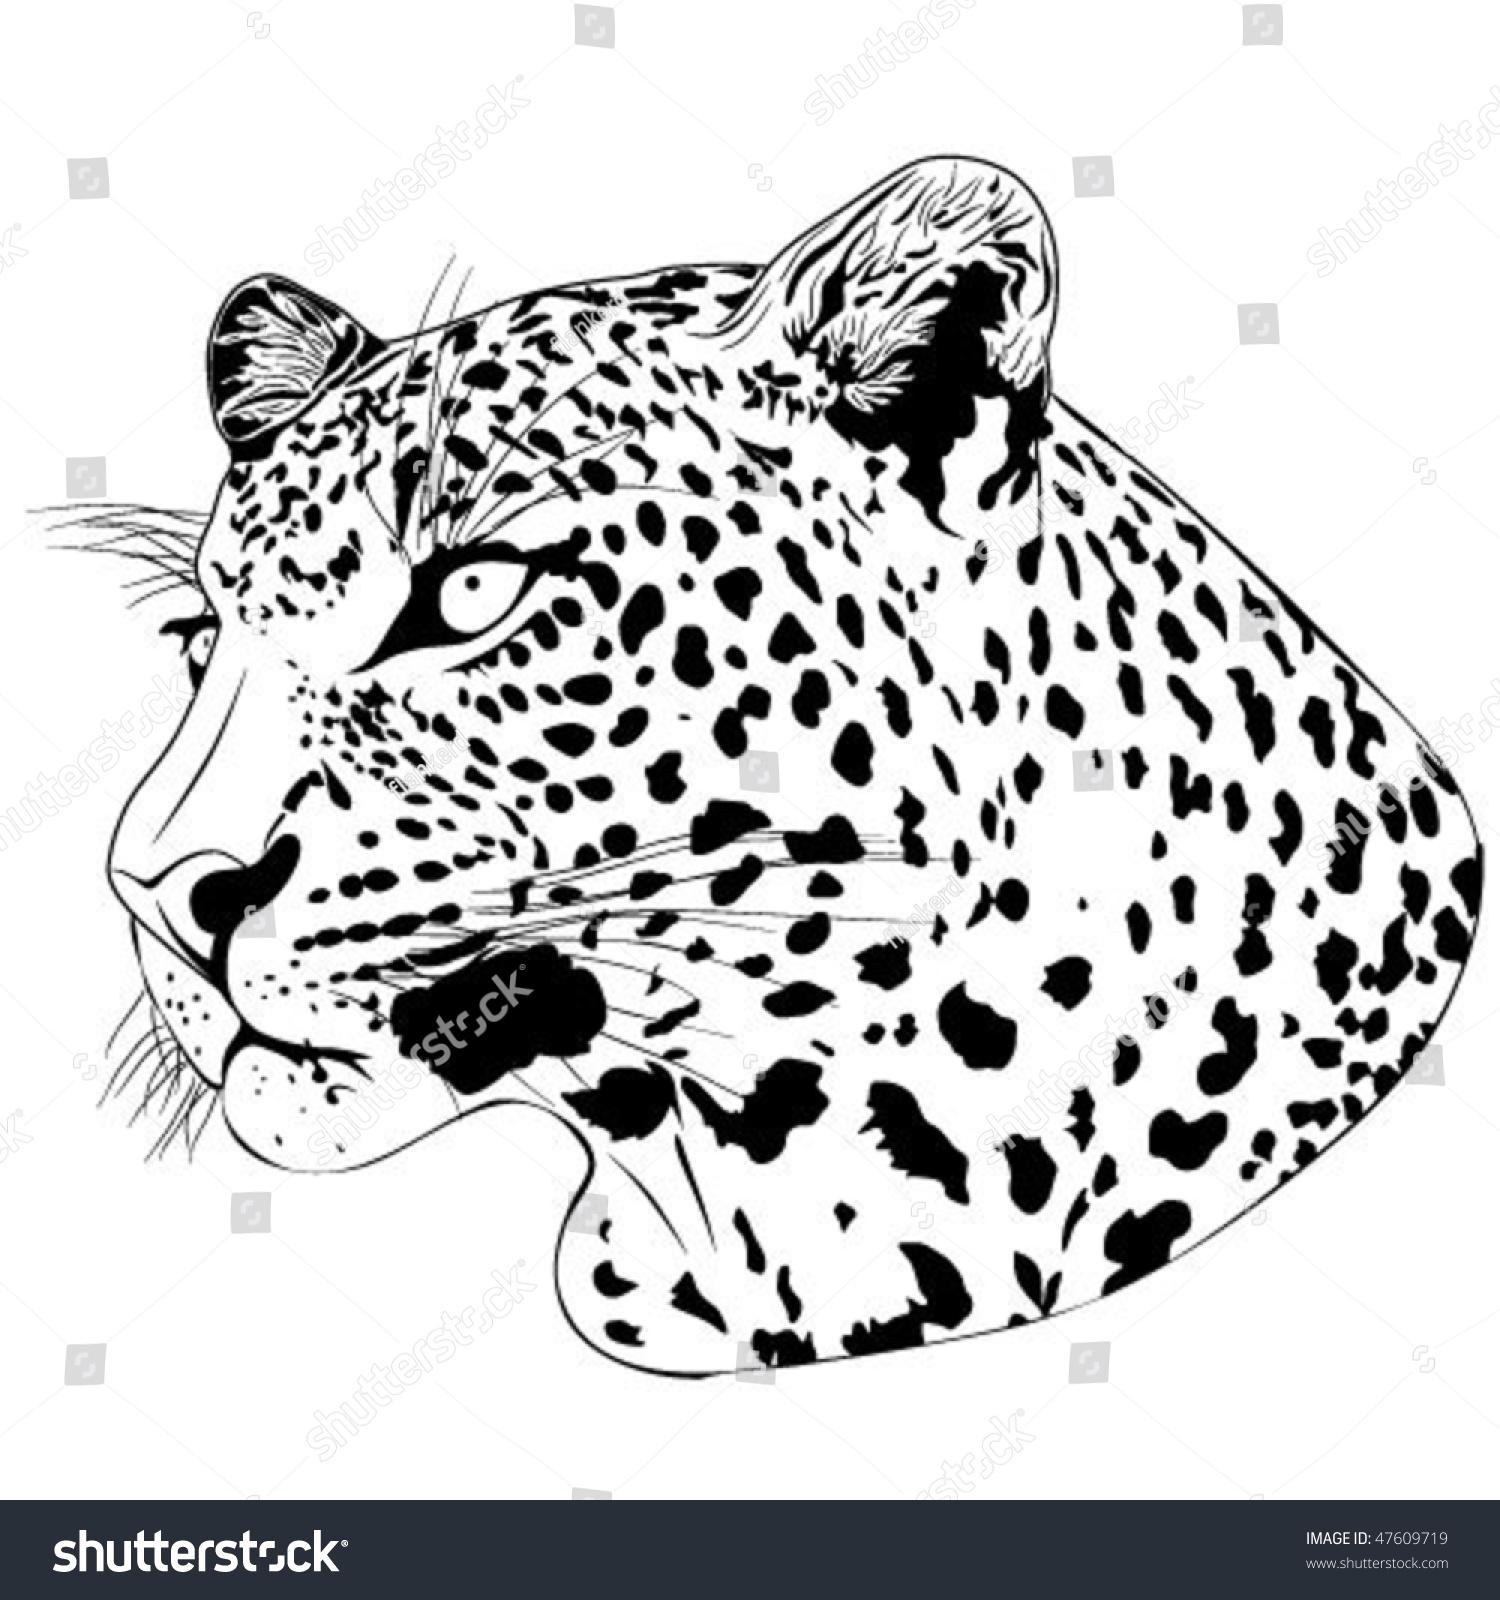 leopard tattoo stock vector 47609719 shutterstock Free Clip Art Animal Print Free Clip Art Zebra Print